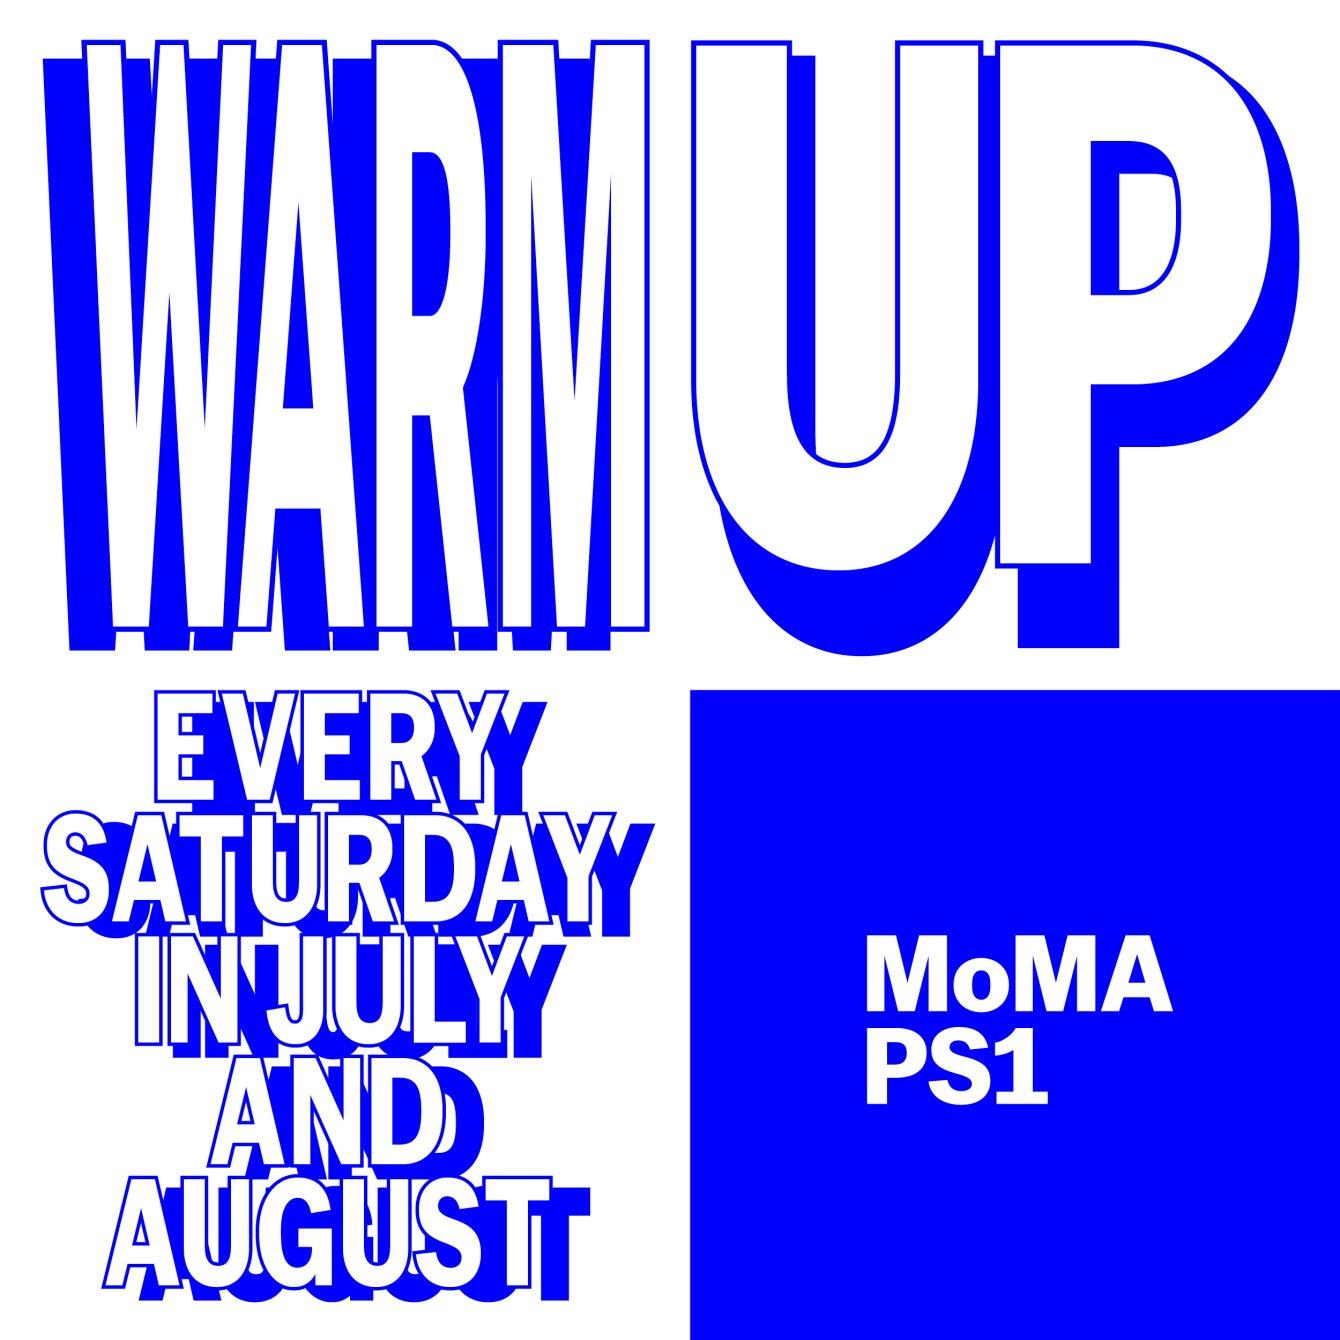 Warm Up: DJ Blass / Equiknoxx/ Mark Ernestus / Mina / BAD Gyal / Ms. Nina / Lil C - Flyer back